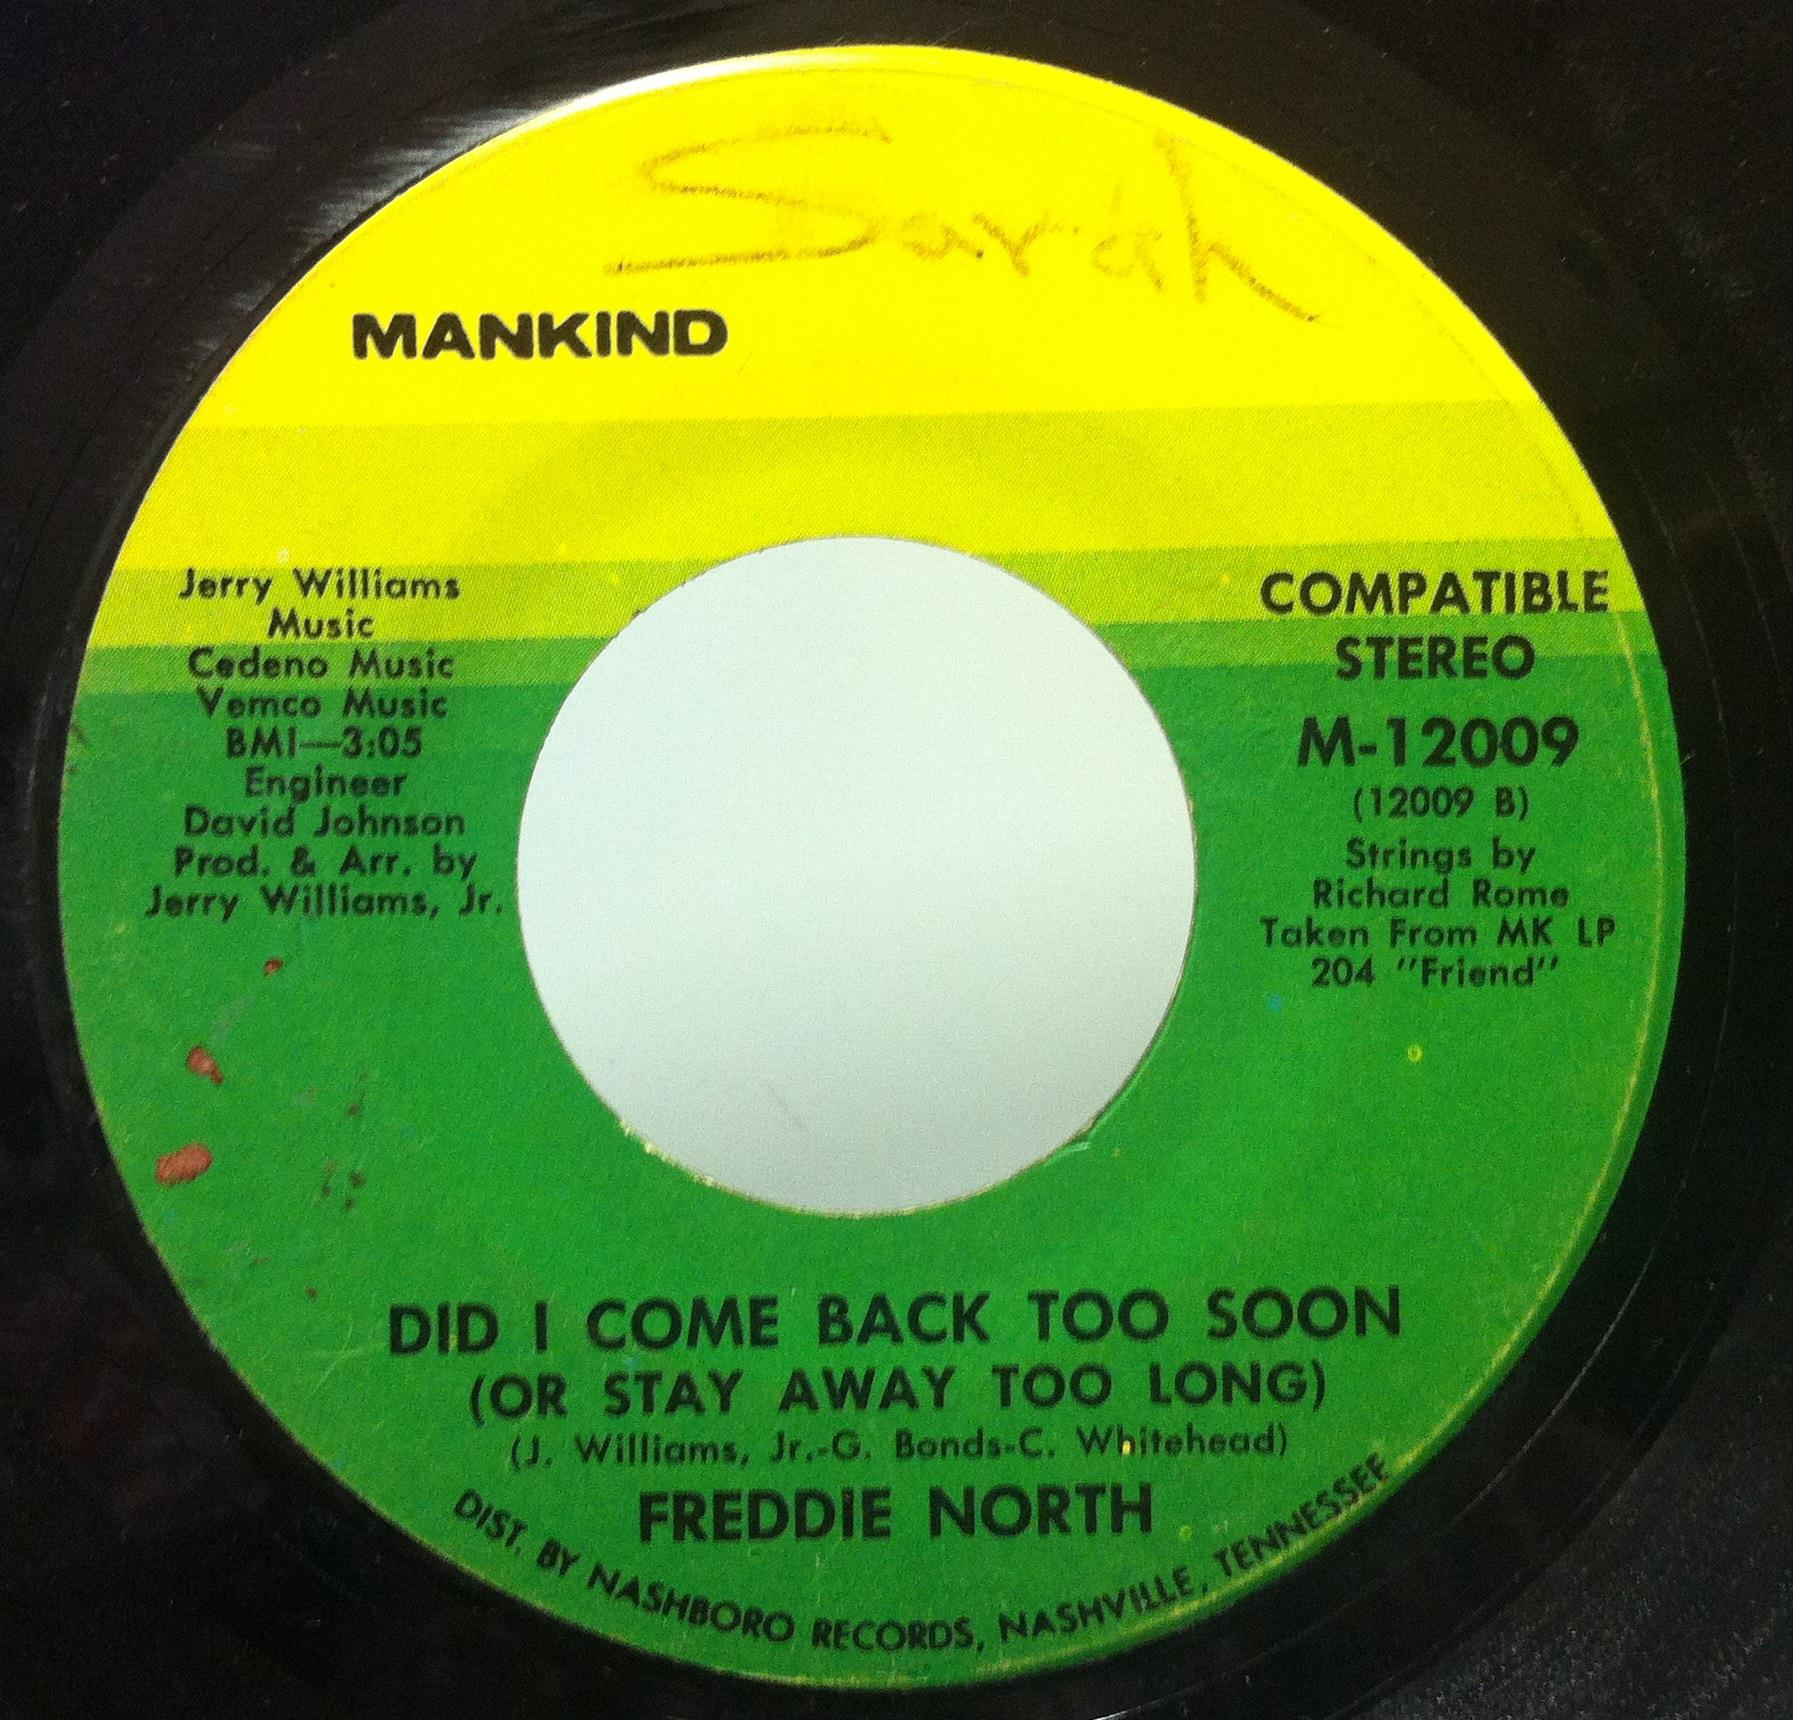 Freddie North Cuss The Wind